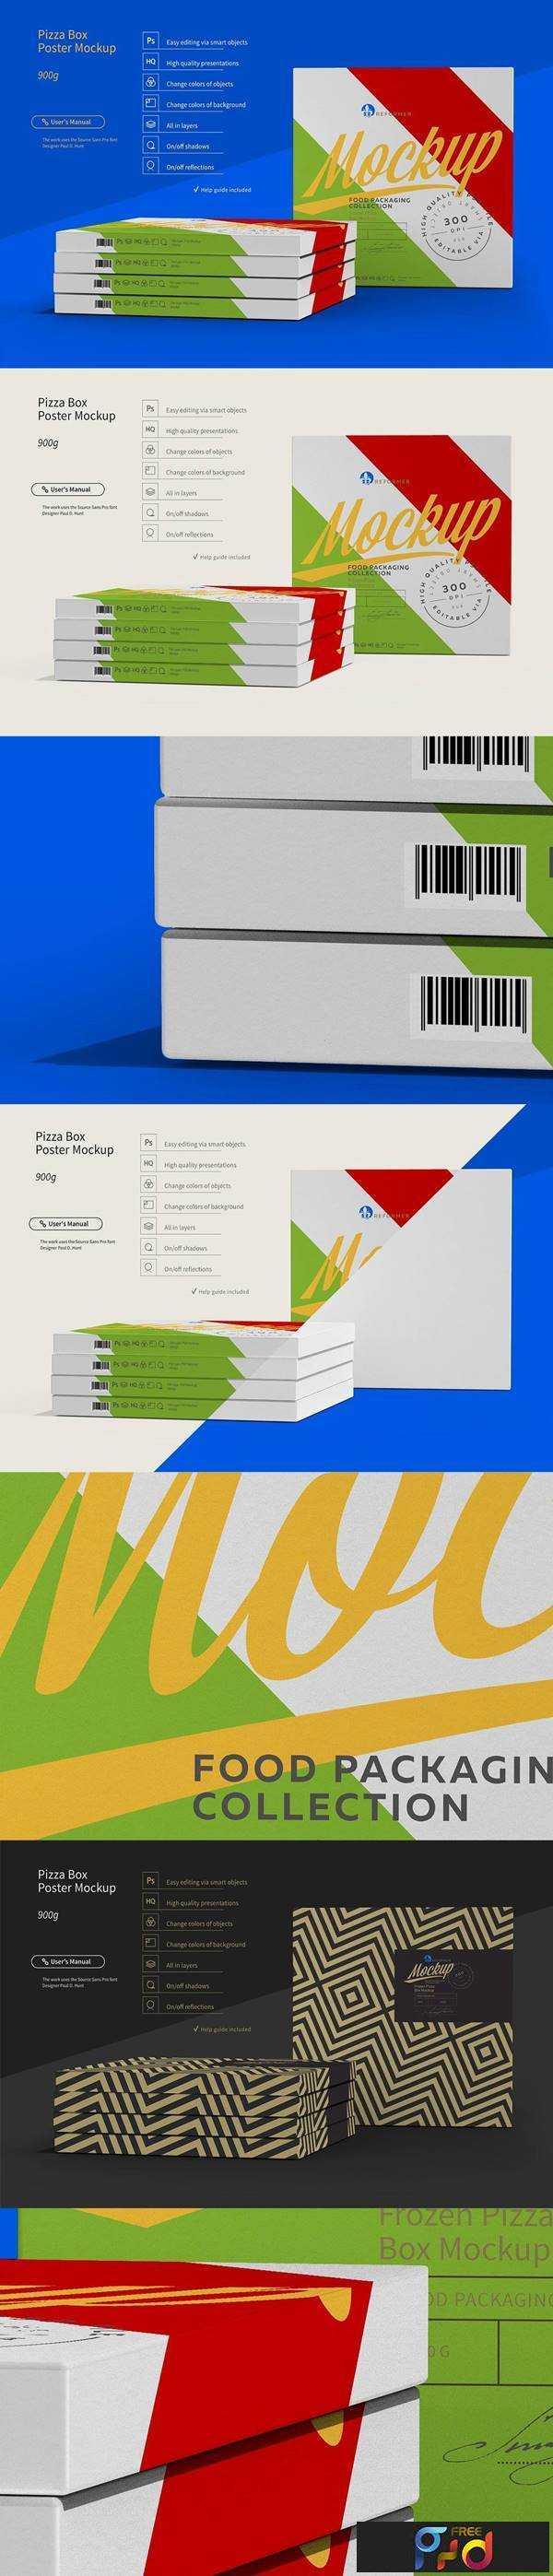 1805285 Pizza Box Poster Mockup 2430363 1